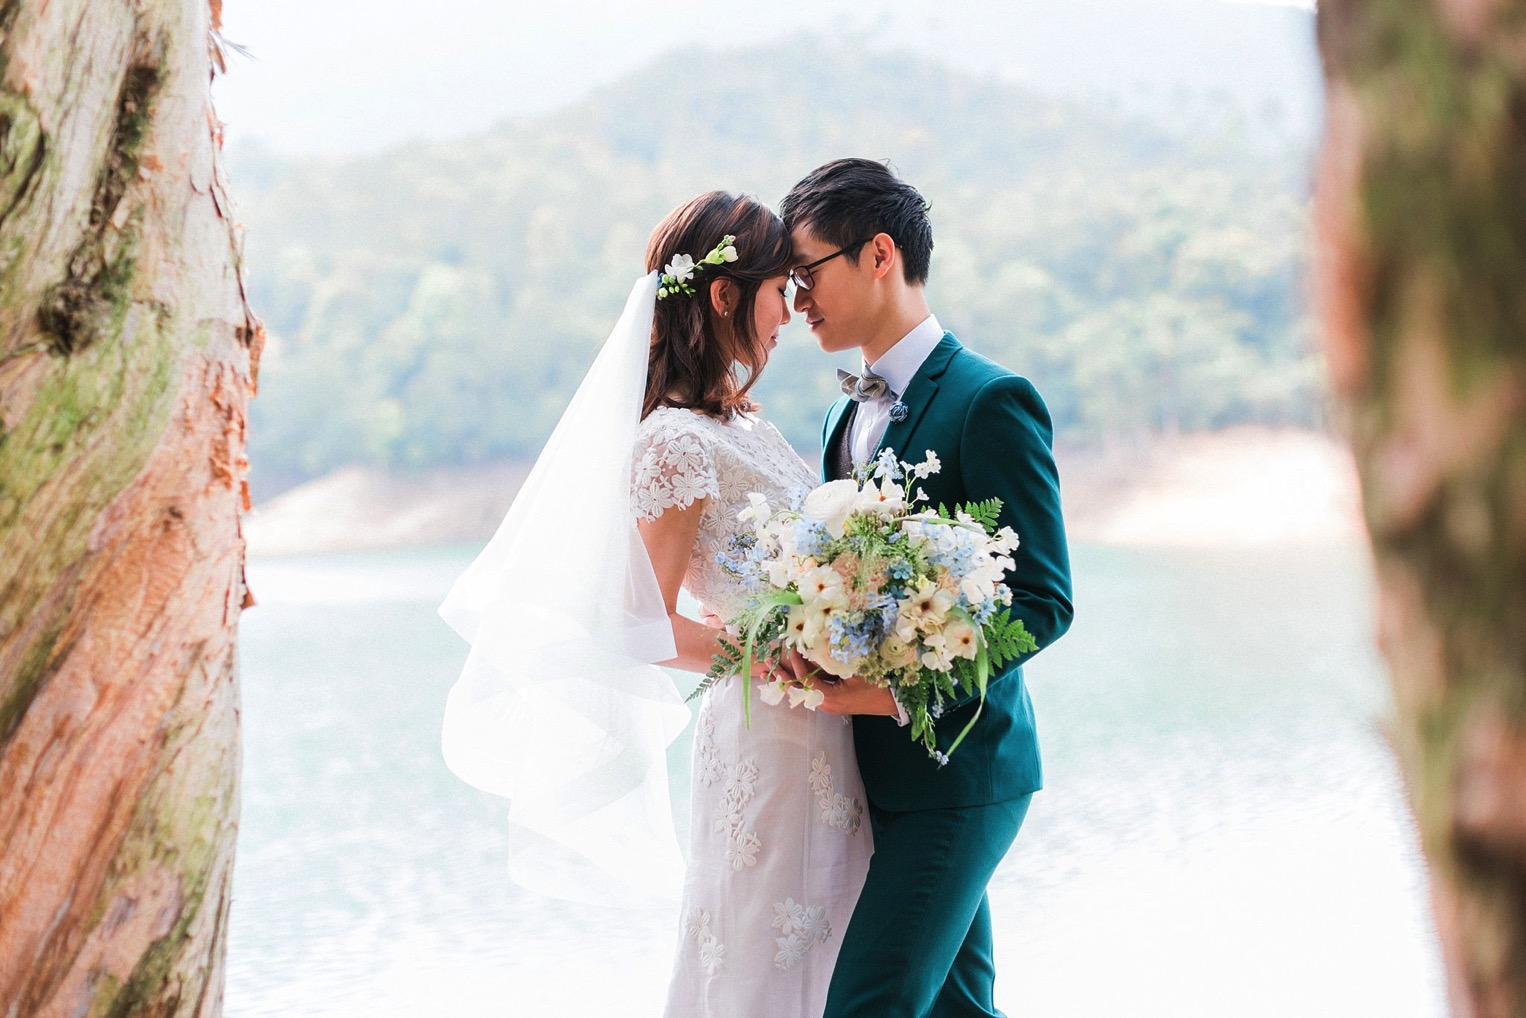 French Grey Photography Hong Kong Prewedding78